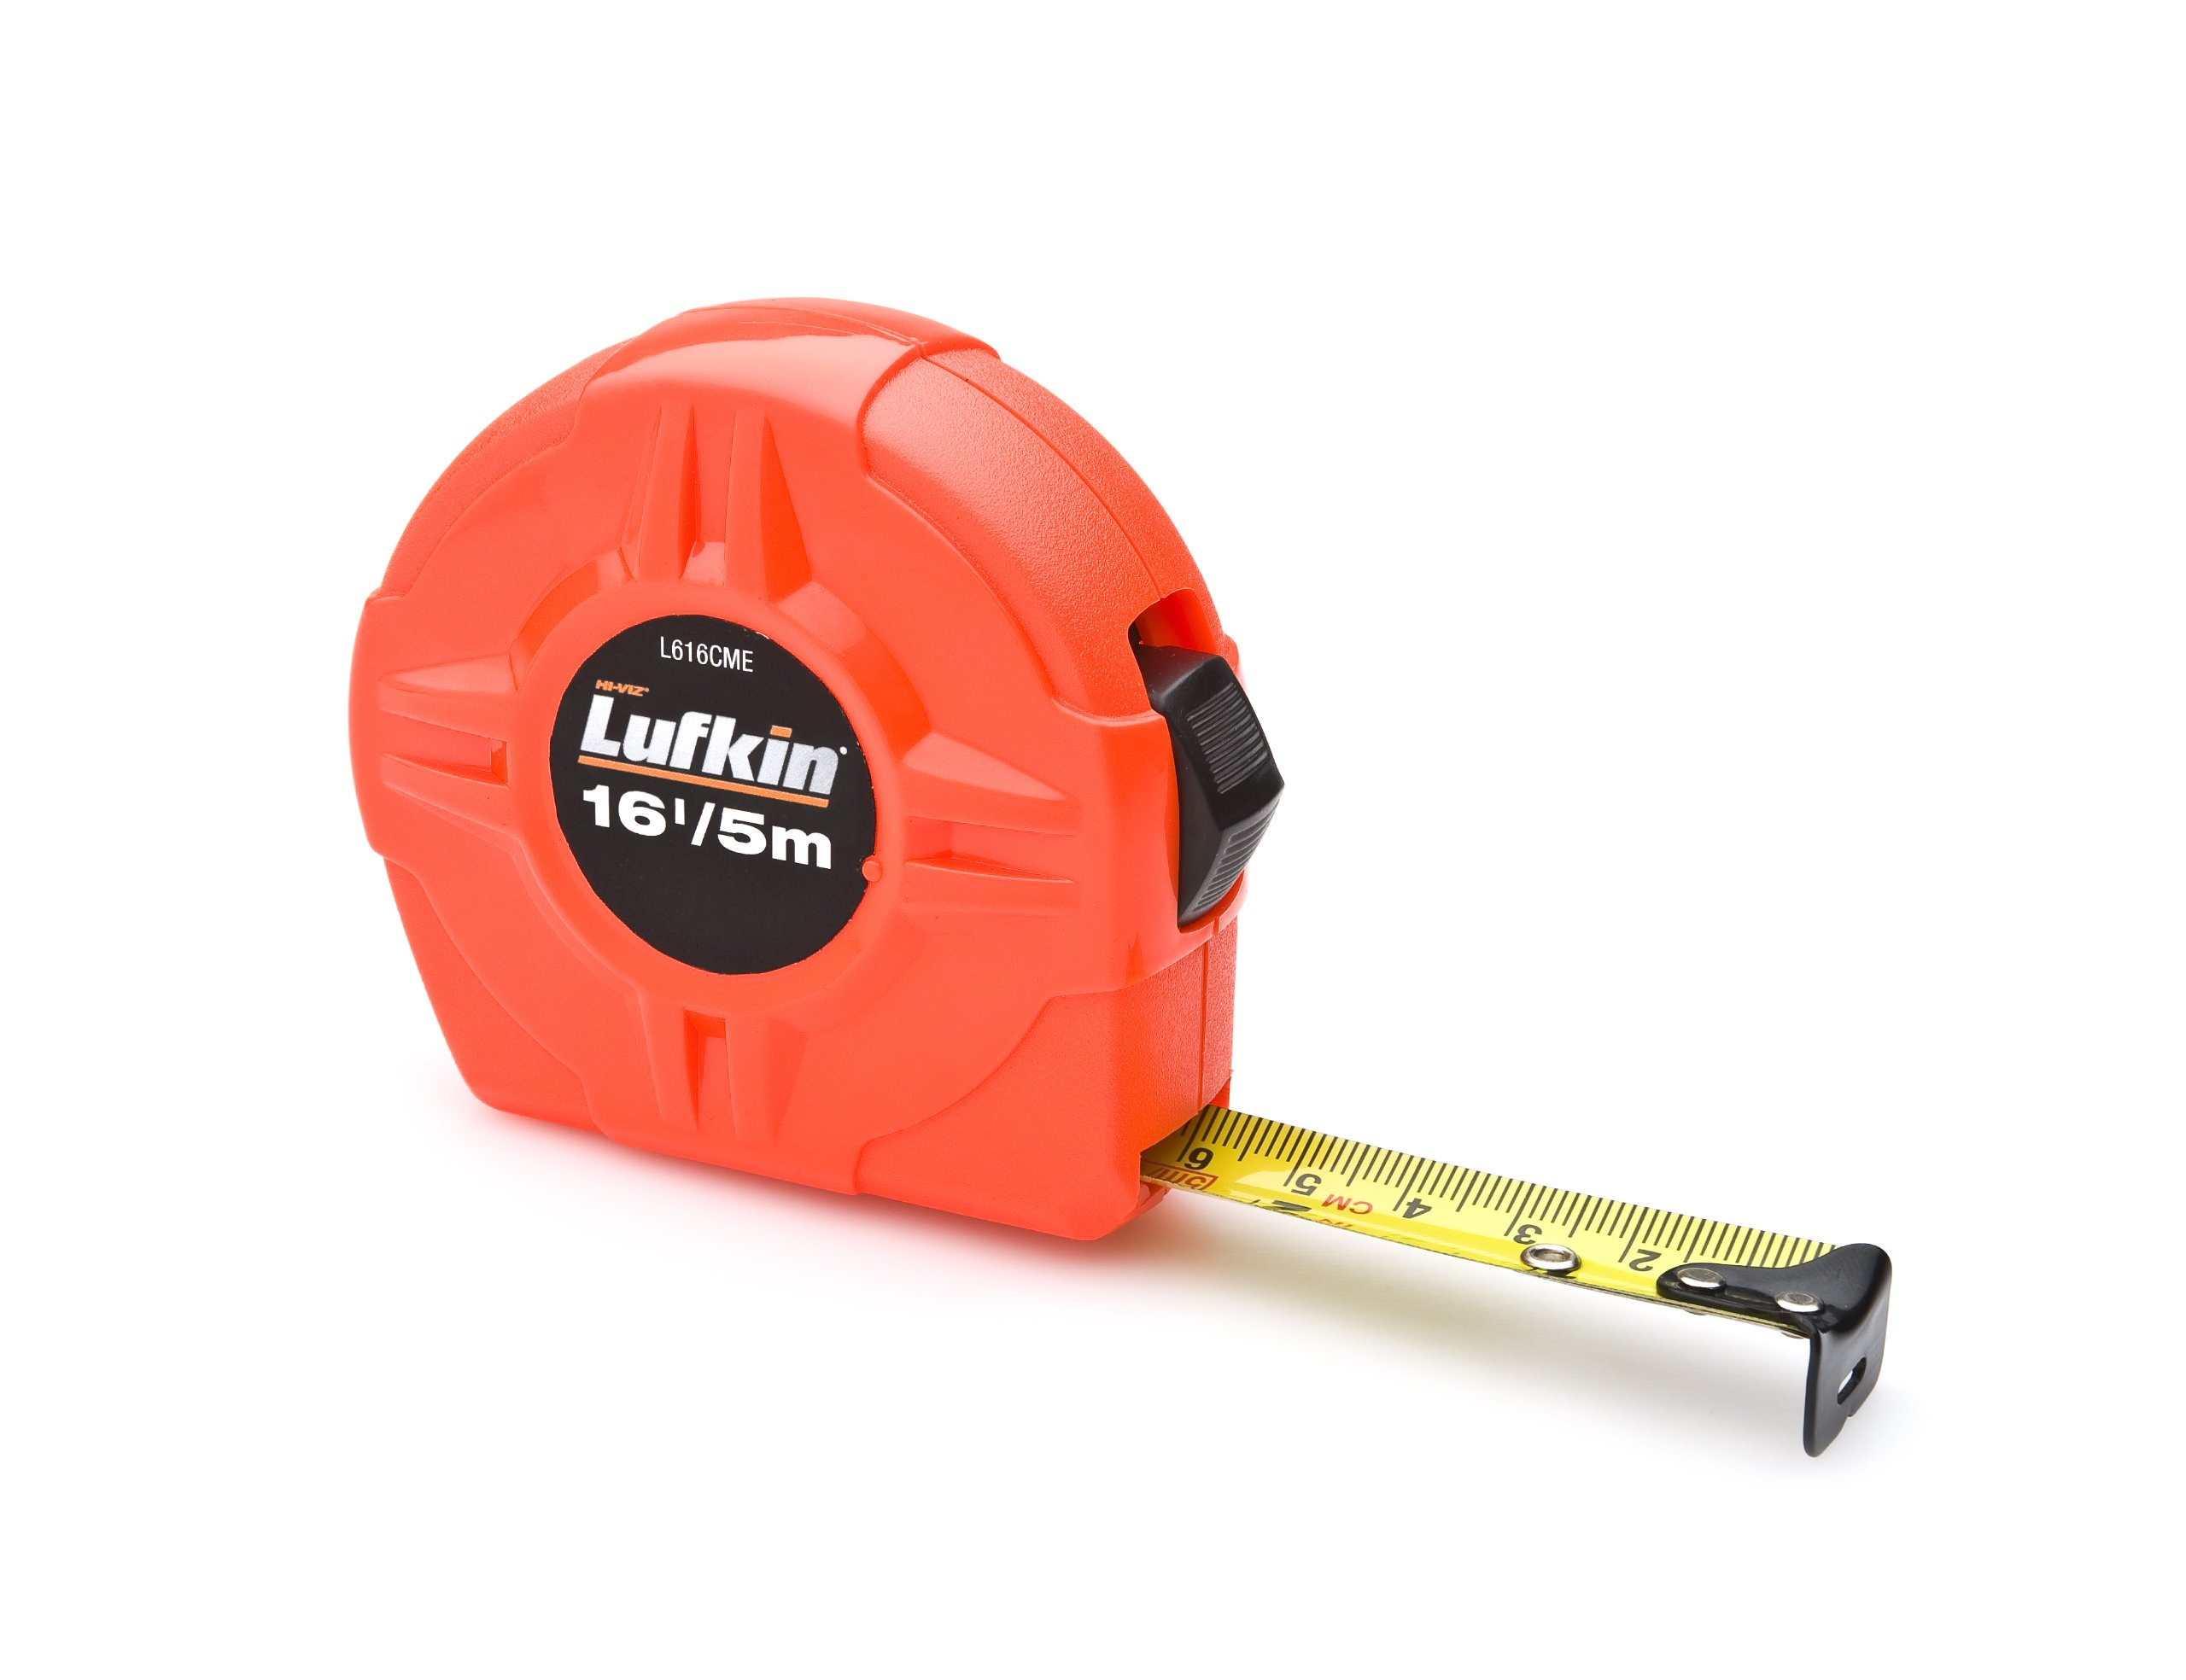 Lufkin L616CME 3/4-Inch/19mm x 16-Foot/5m Hi-Viz Orange Power Return Value Tape